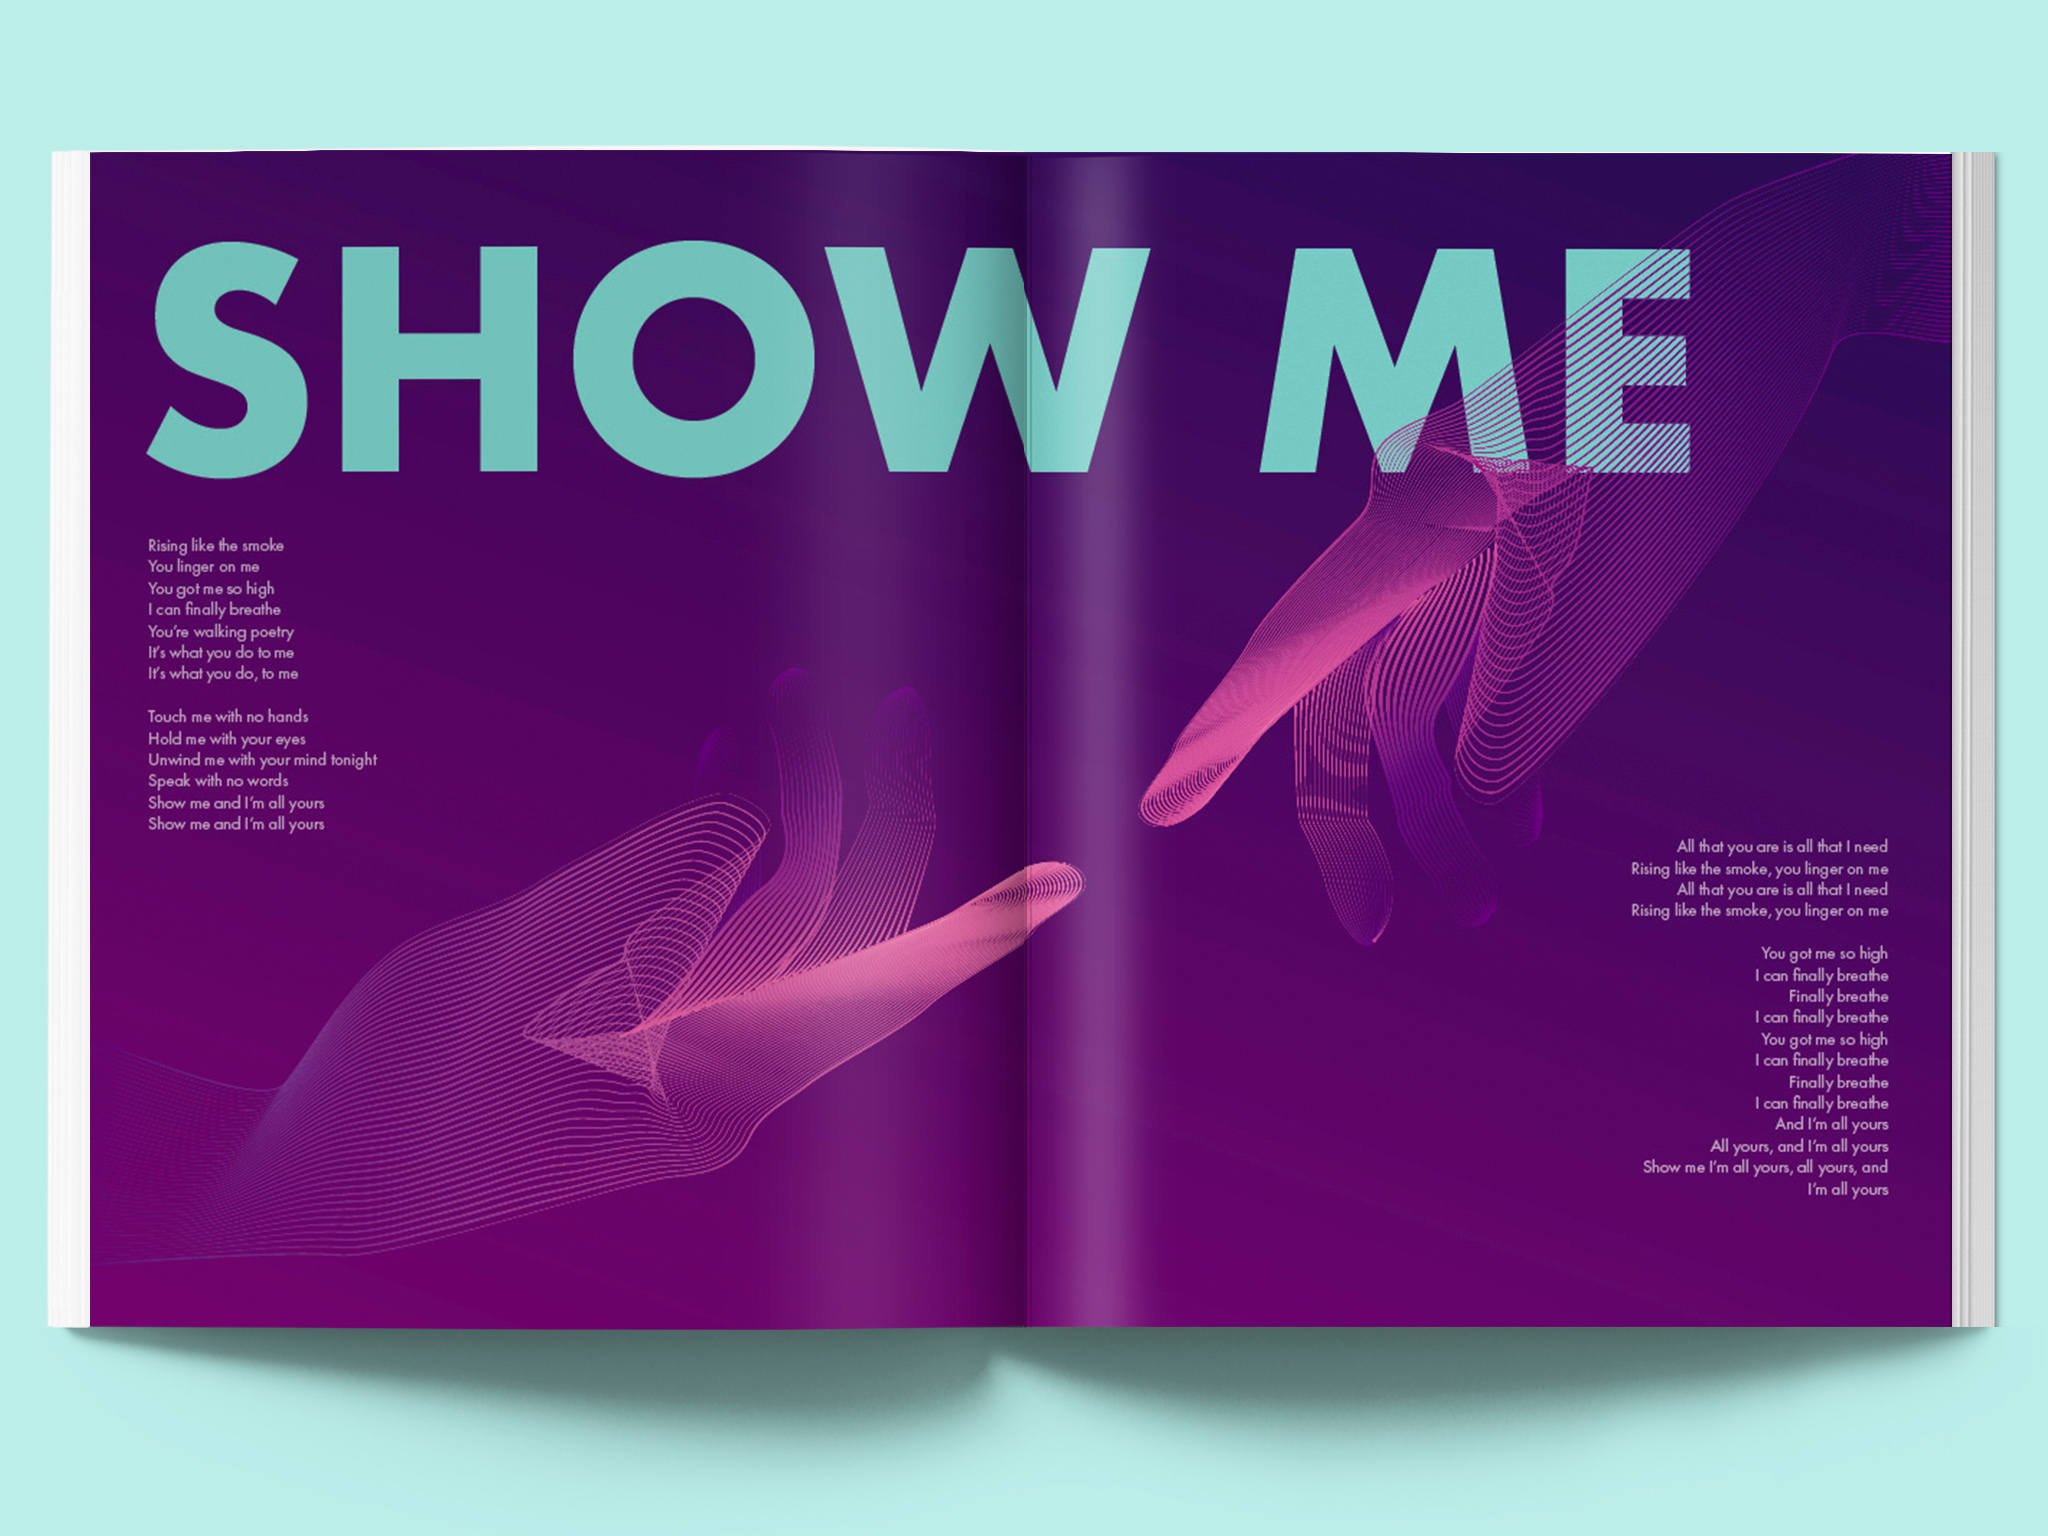 showme_color.jpg